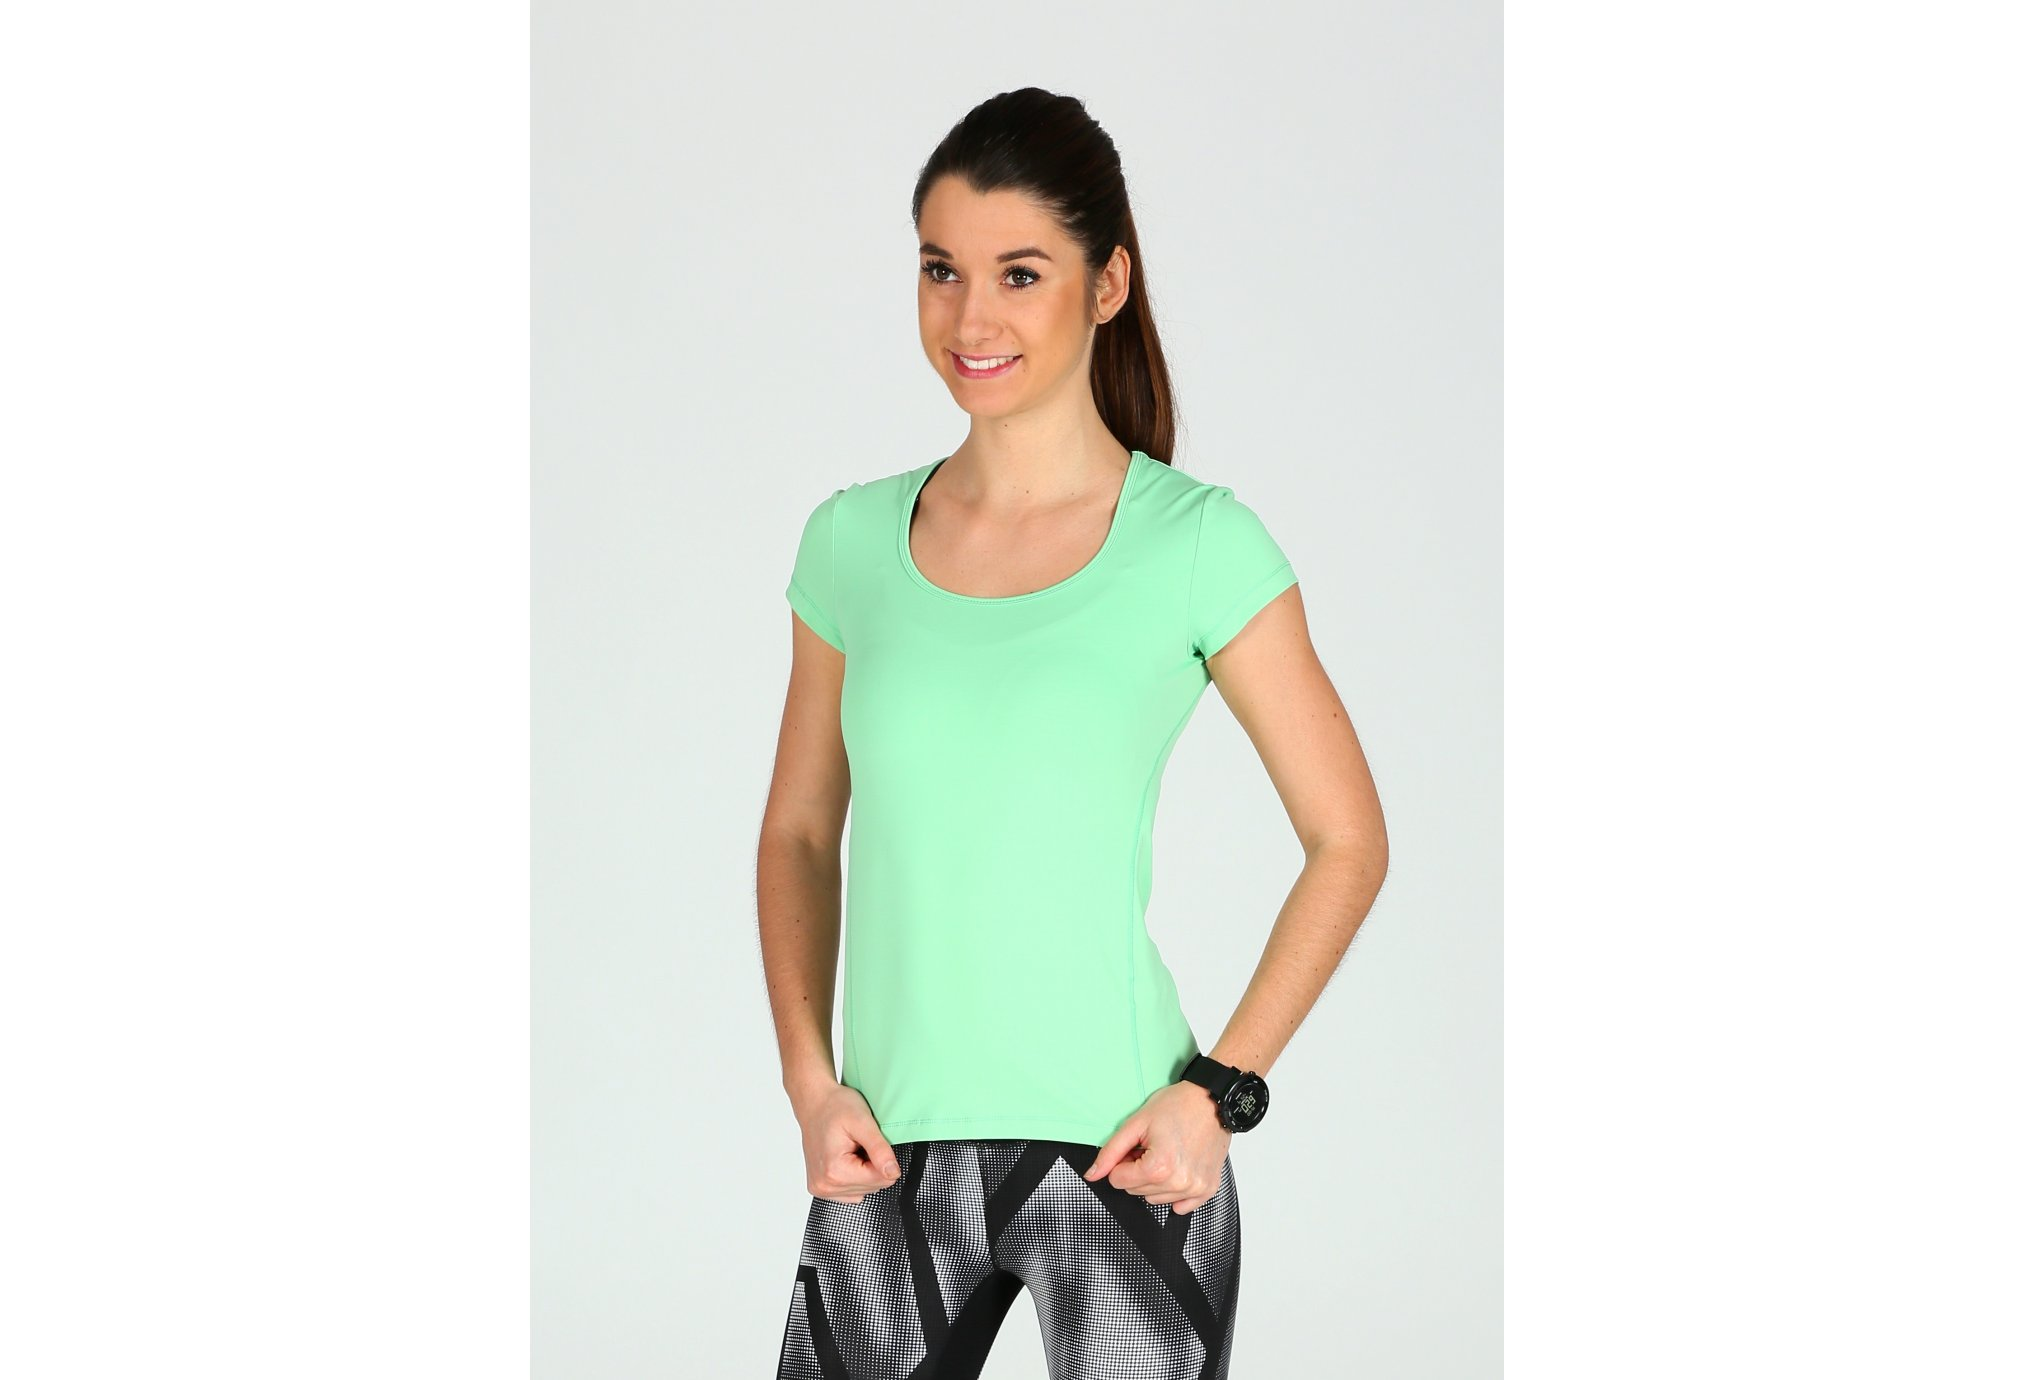 Cyclo randonneurs saint chamonais - Casall Tee-shirt Essential ... 655500610cb